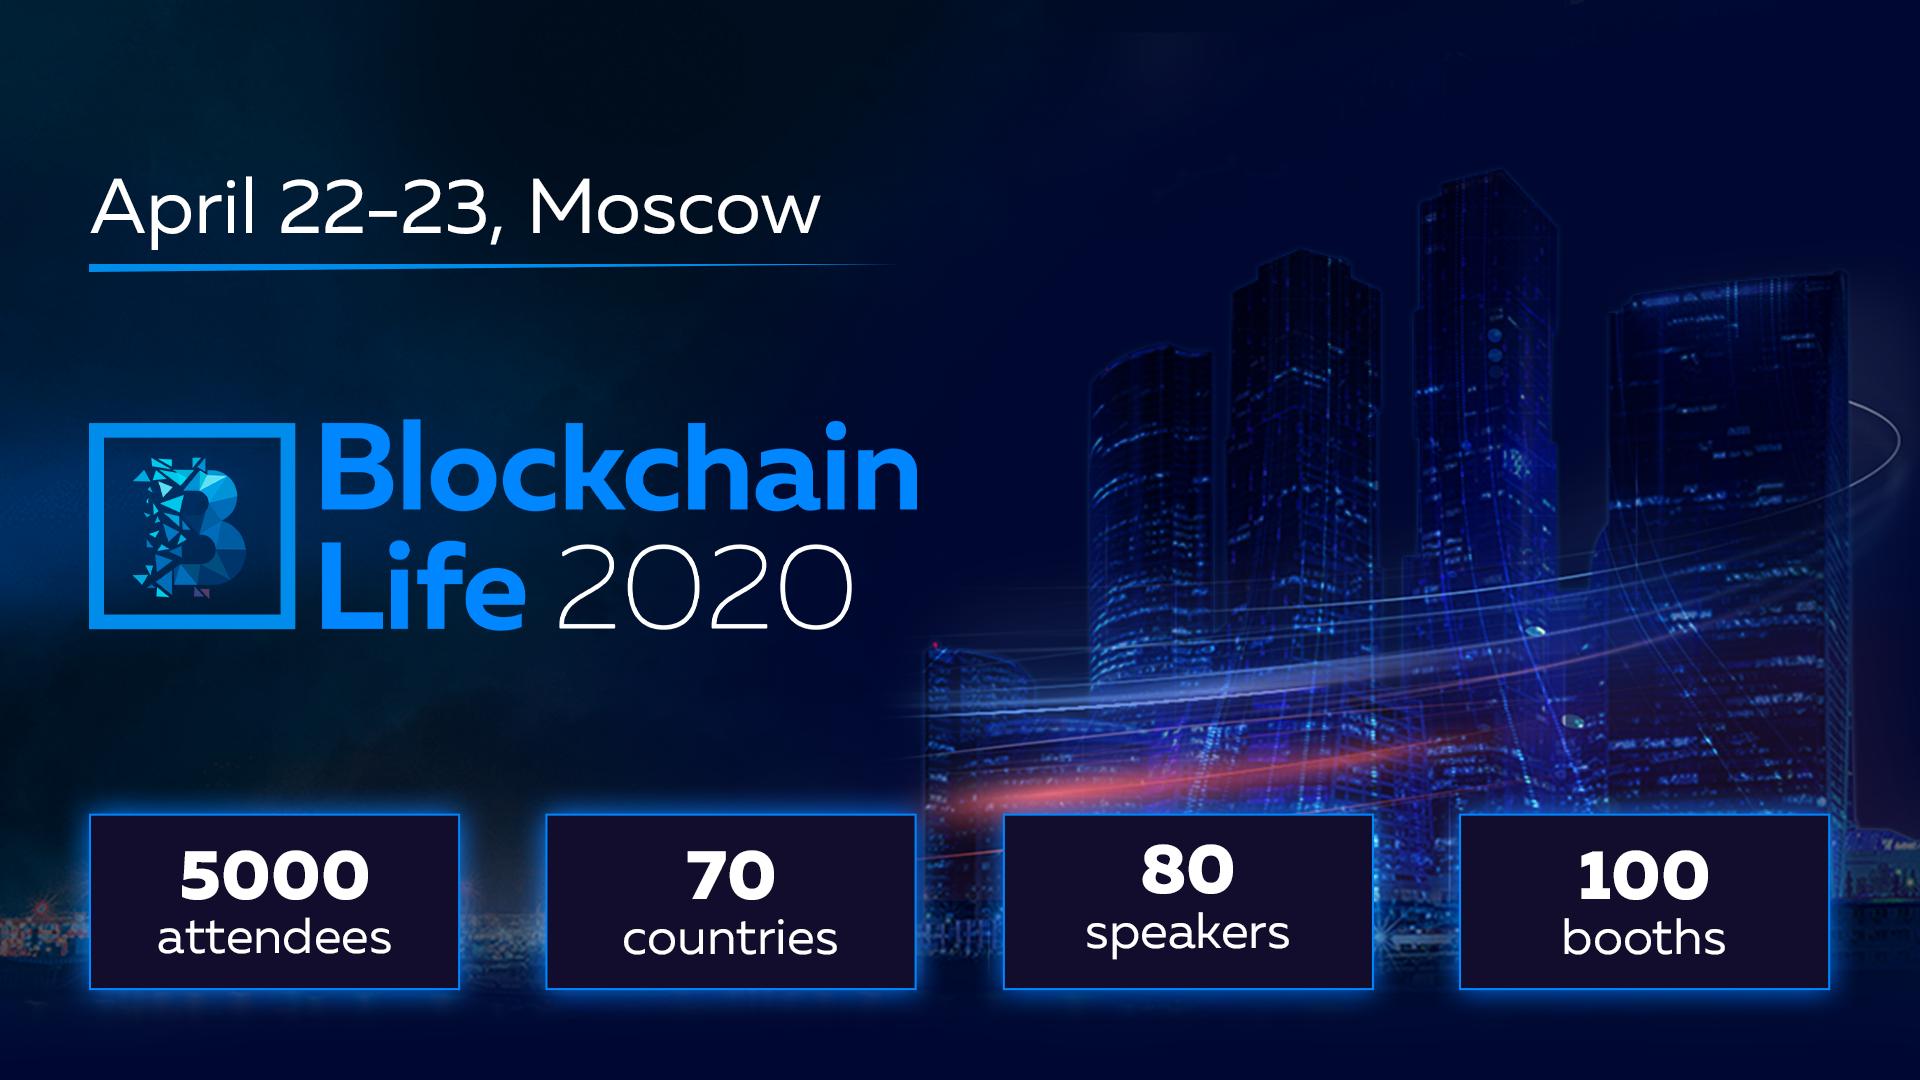 blockchain life 2020 moscow